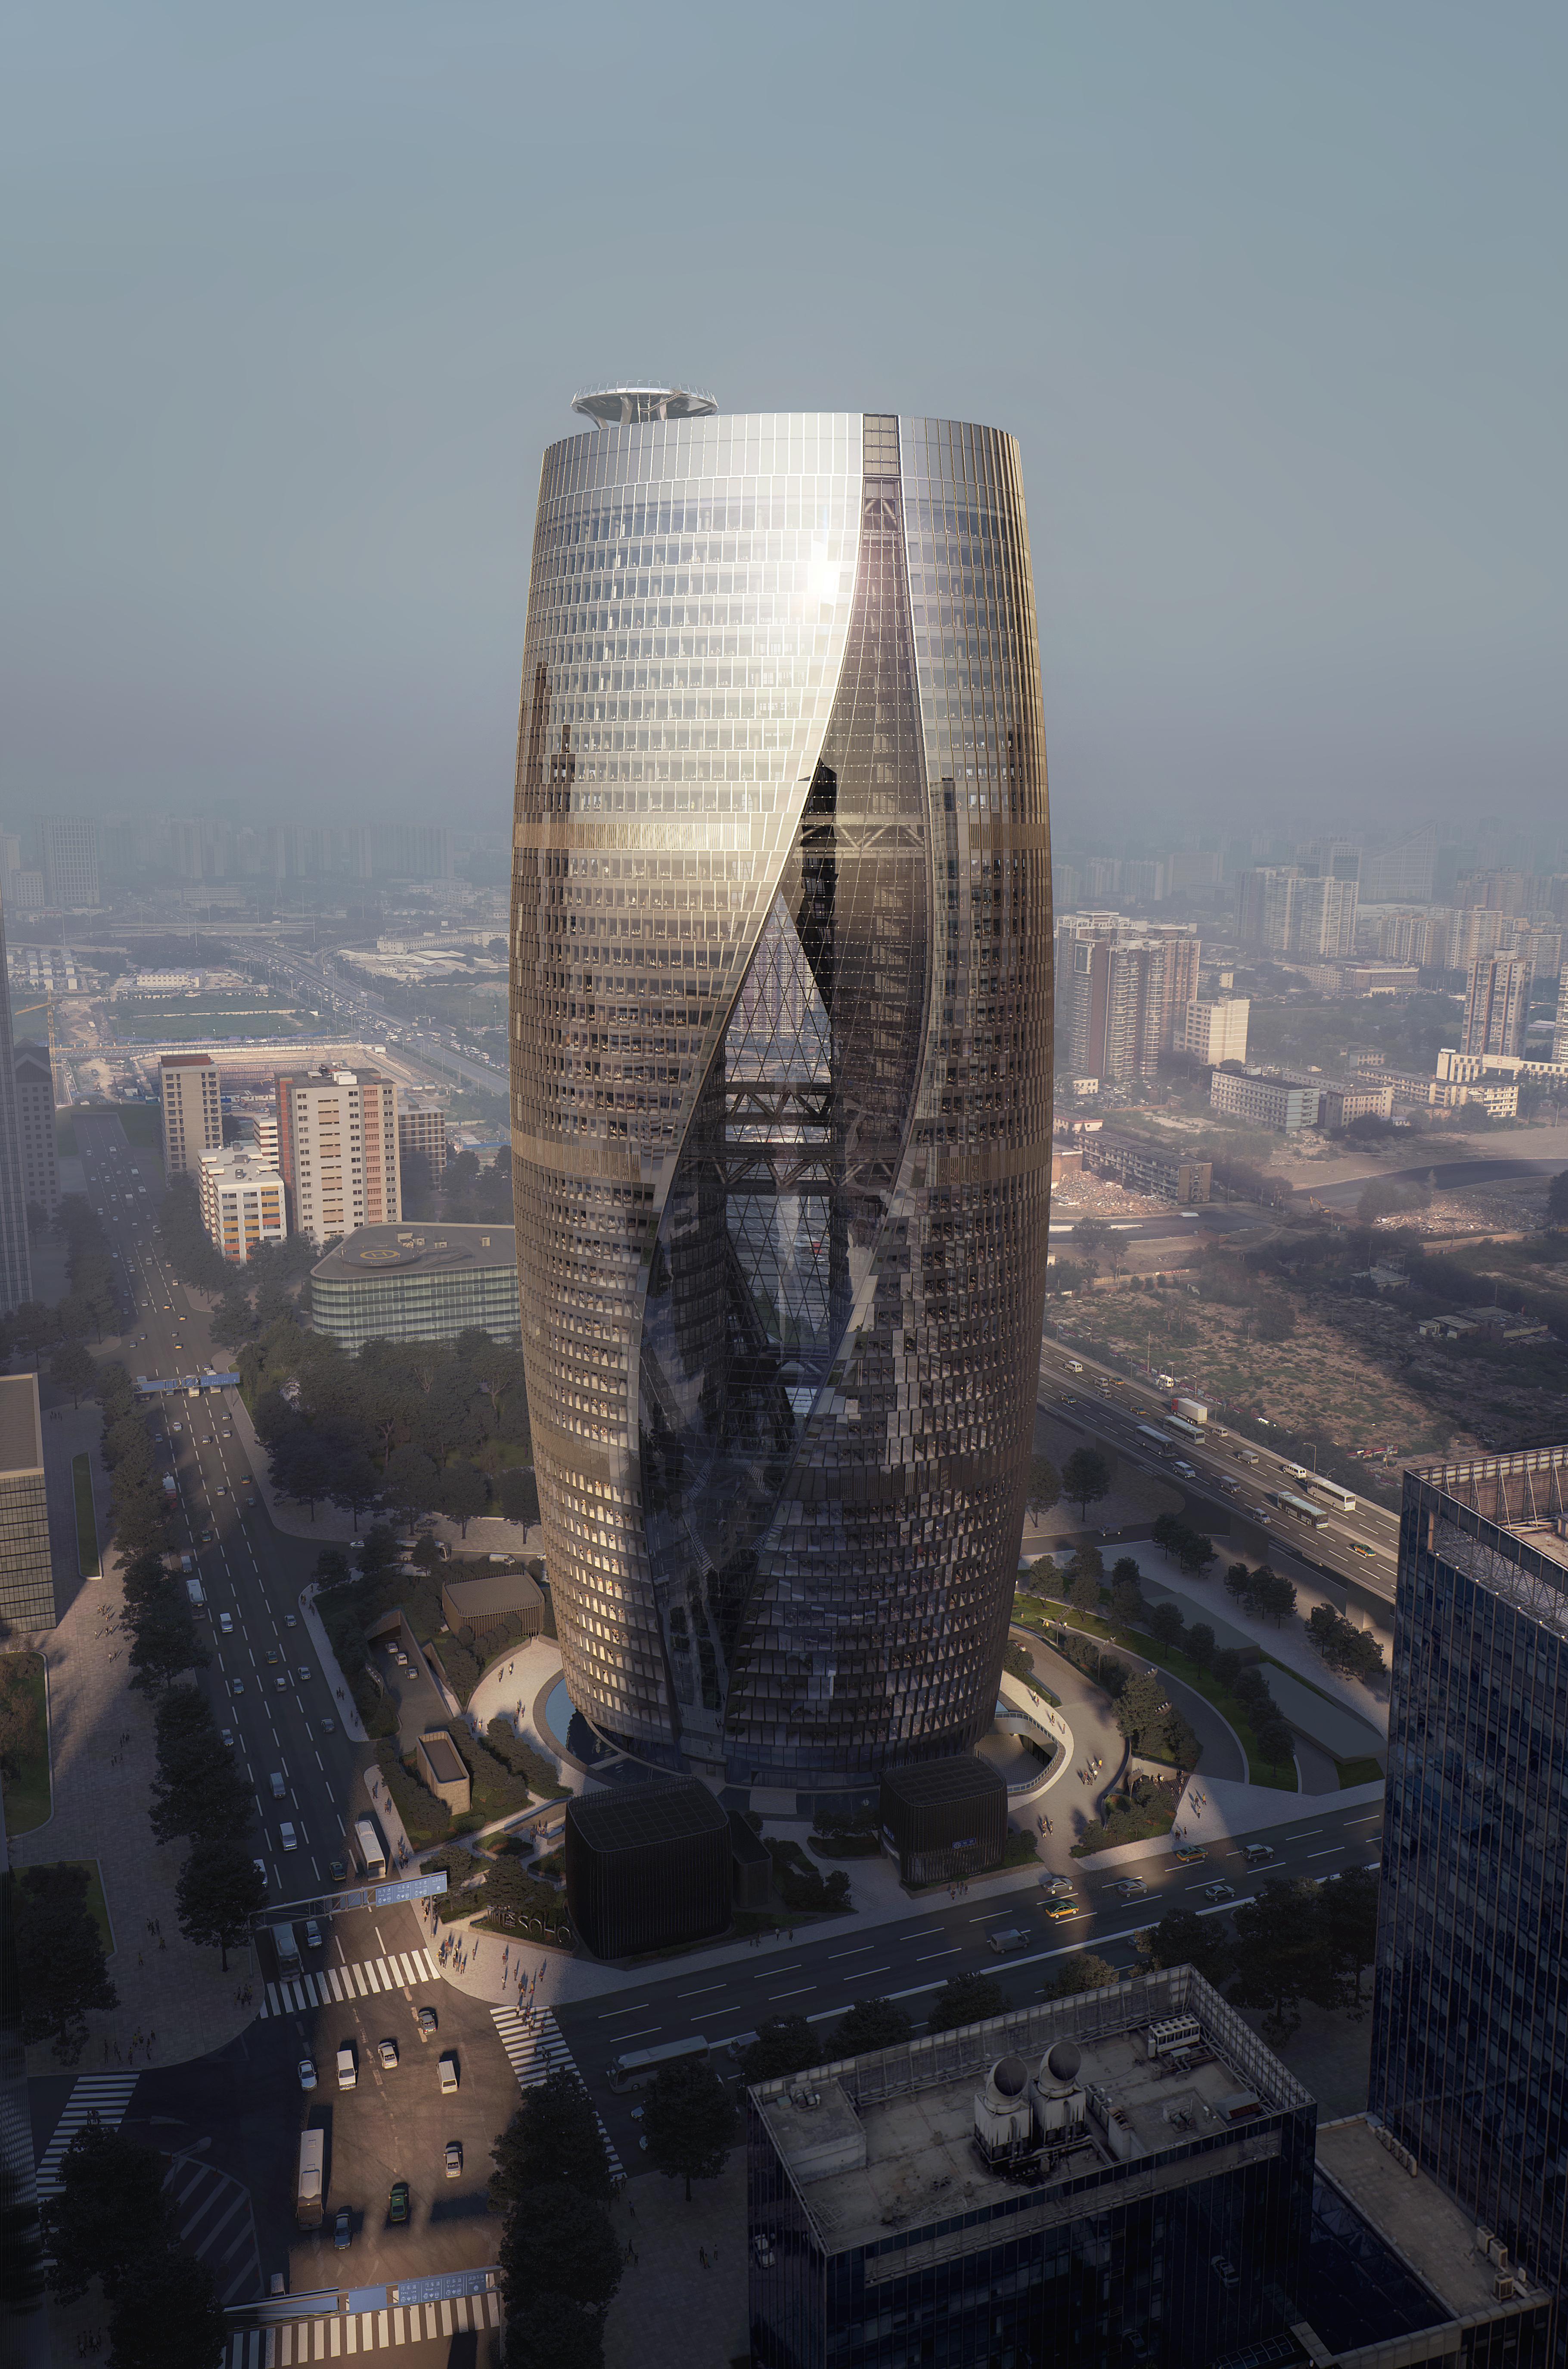 Leeza SOHO Tower by Zaha Hadid Architects housing world's heighest Atrium